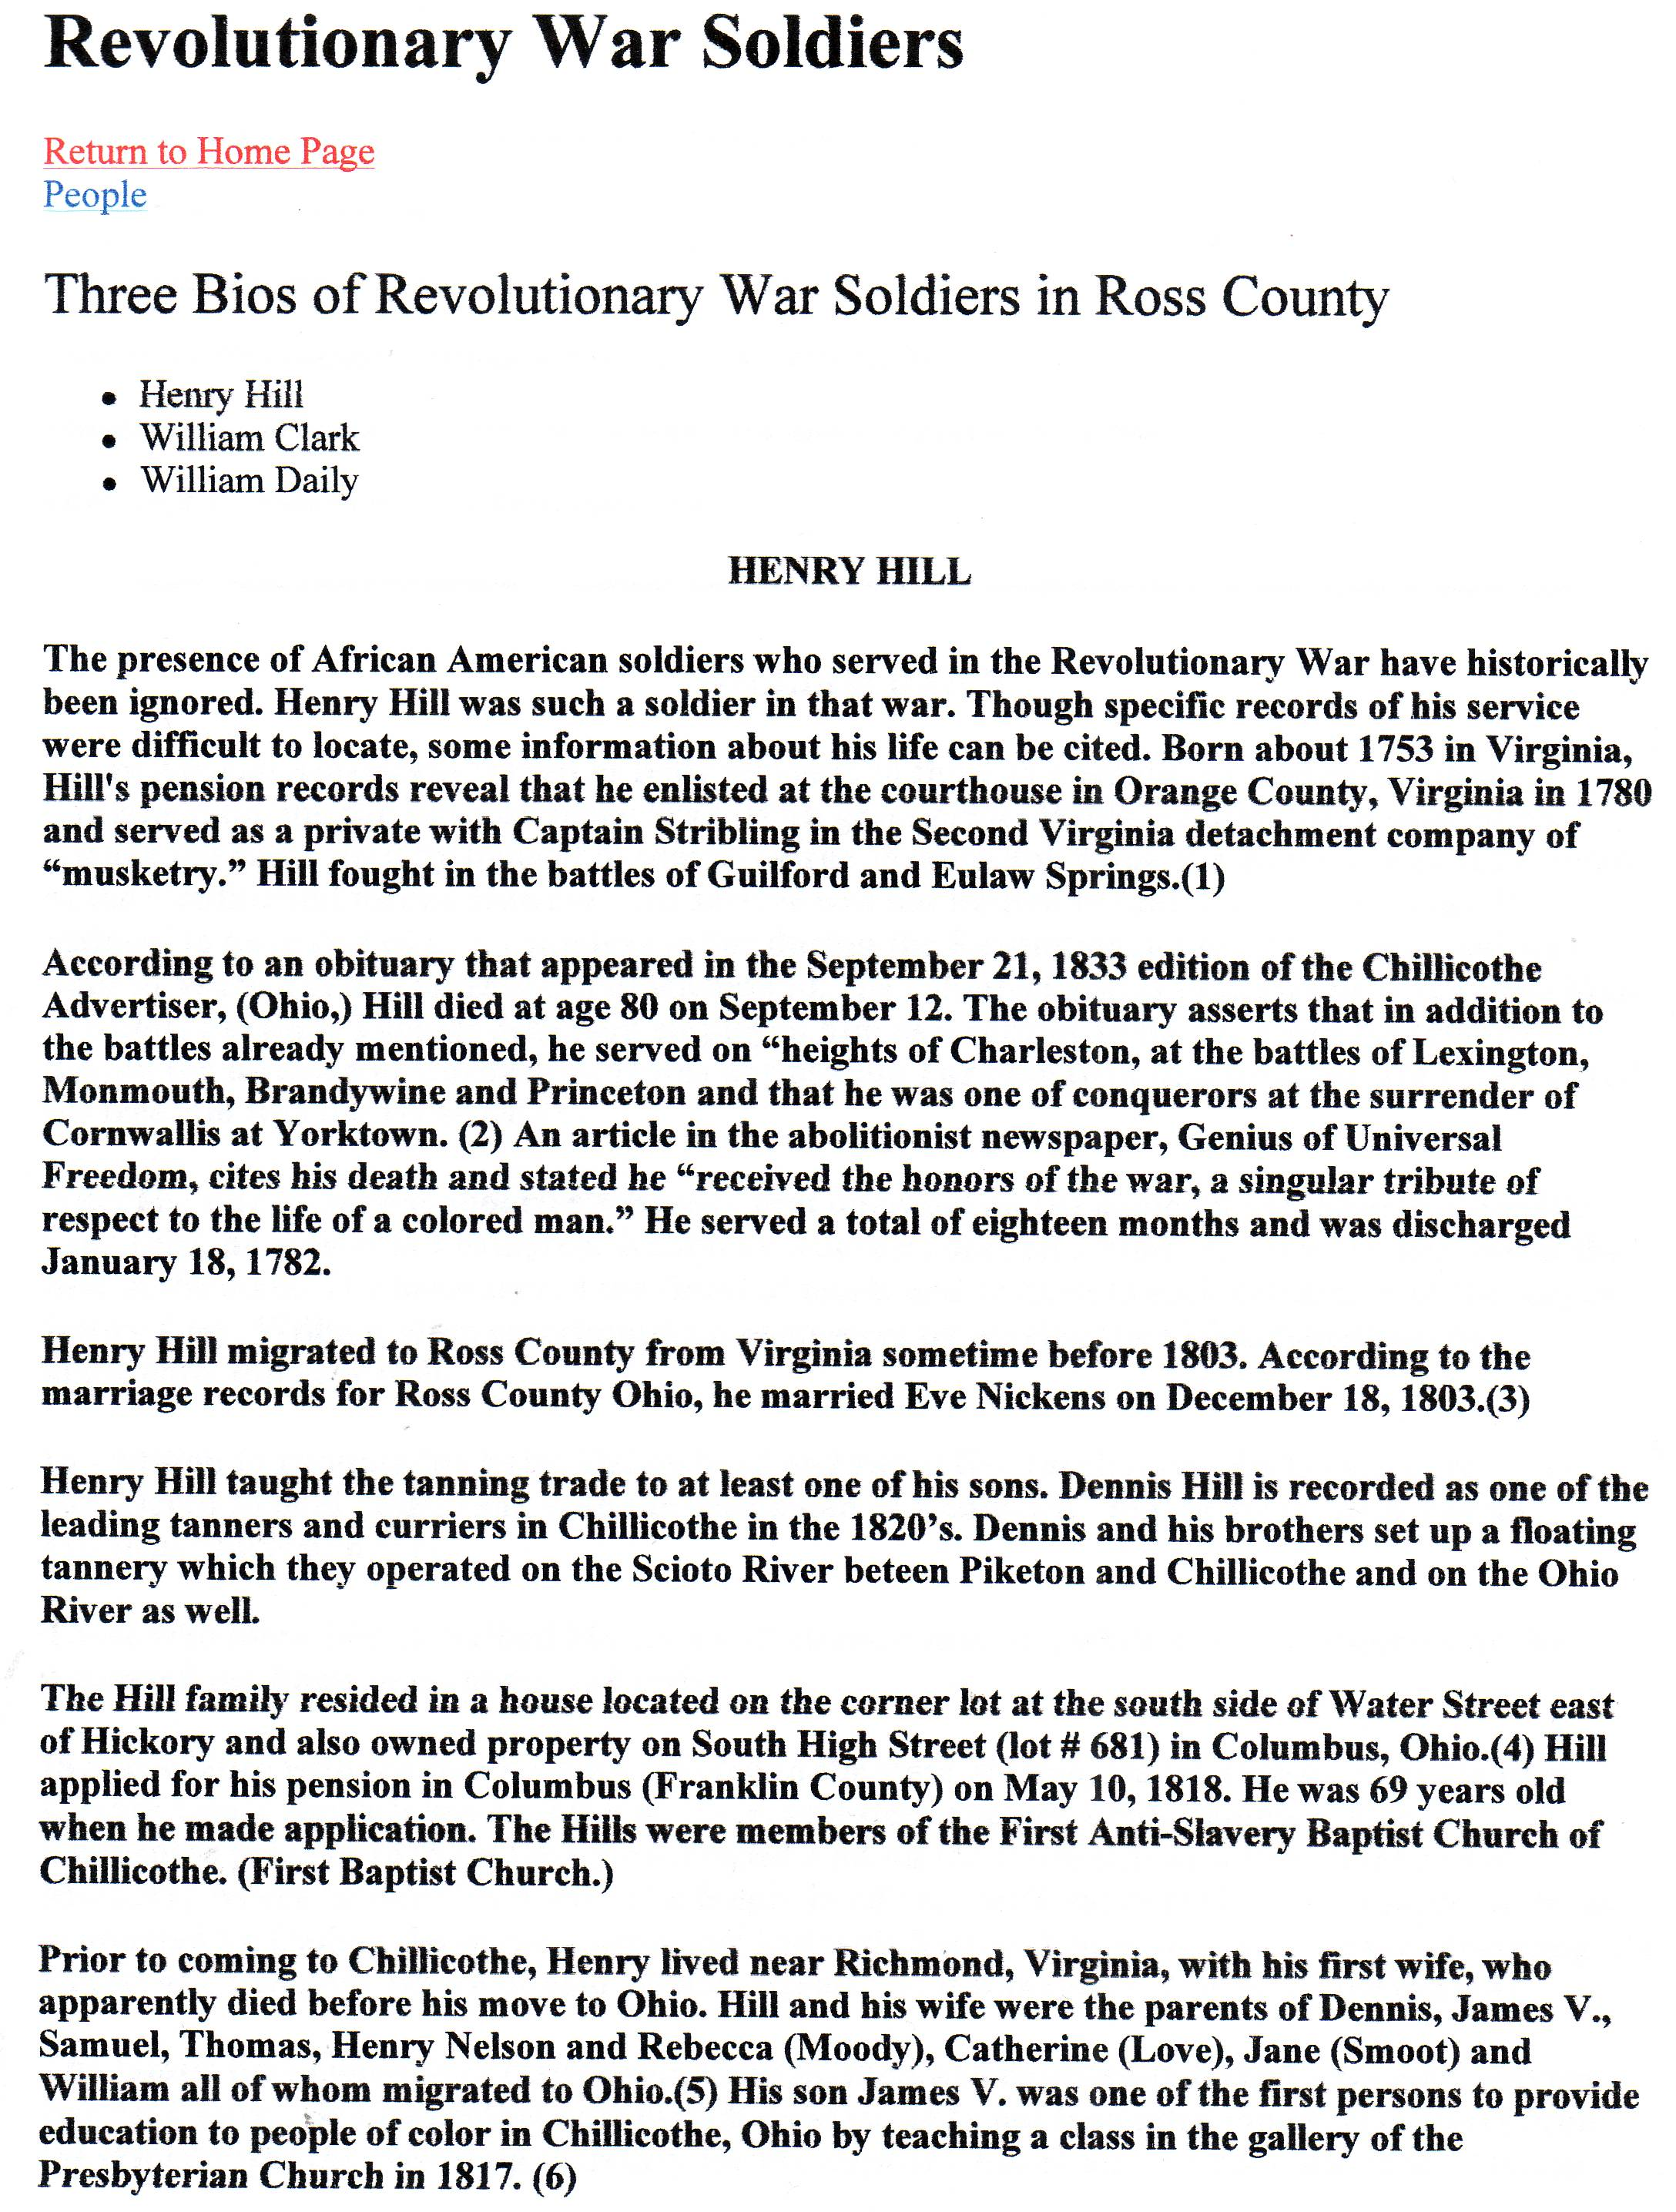 Henry Hill of Ohio born 1753